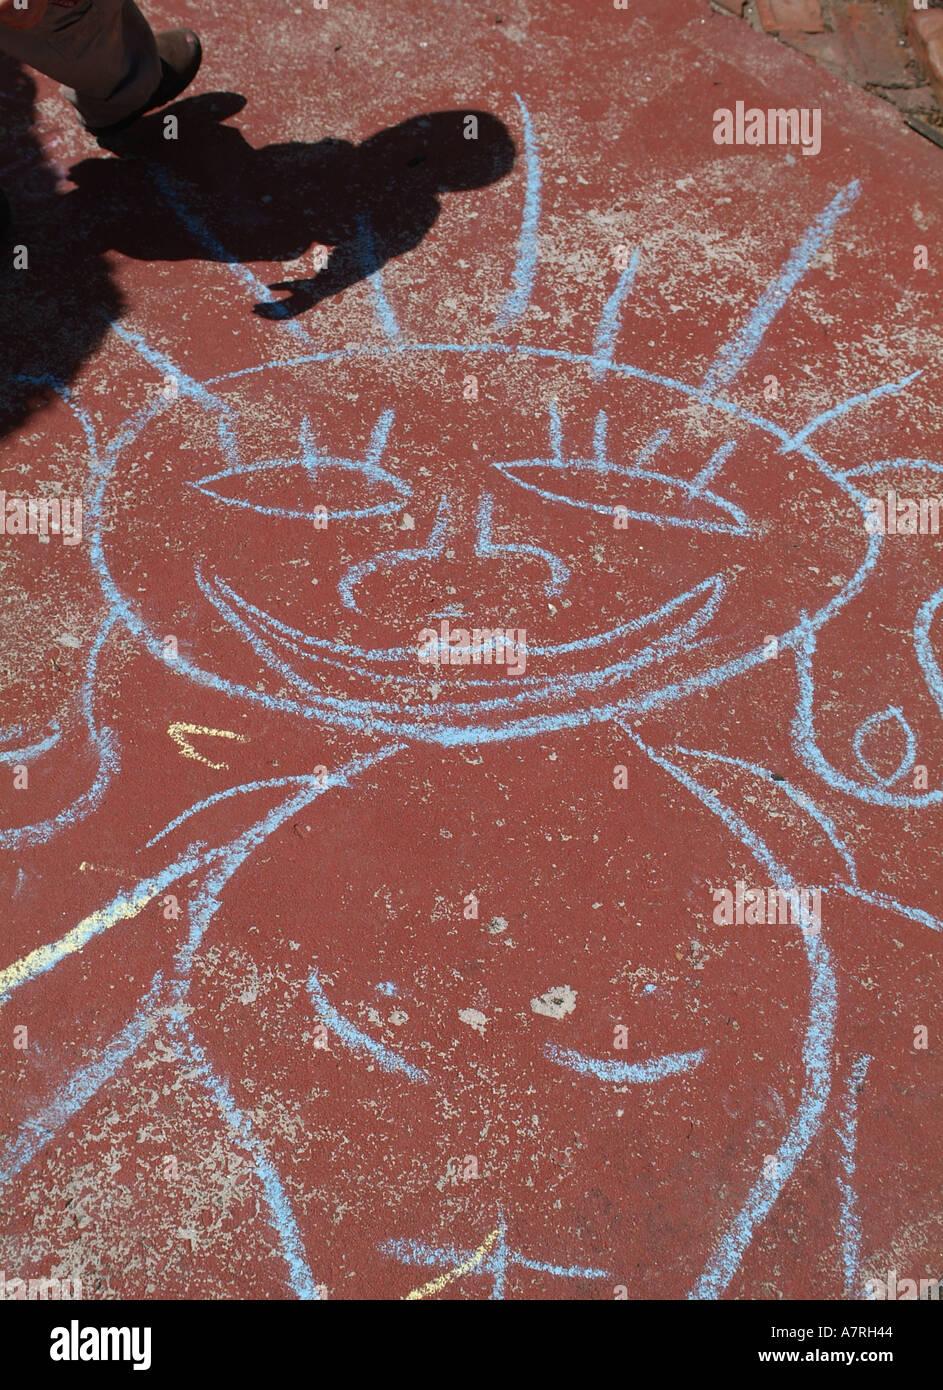 Odd street art chalk drawing figure with shadow - Stock Image